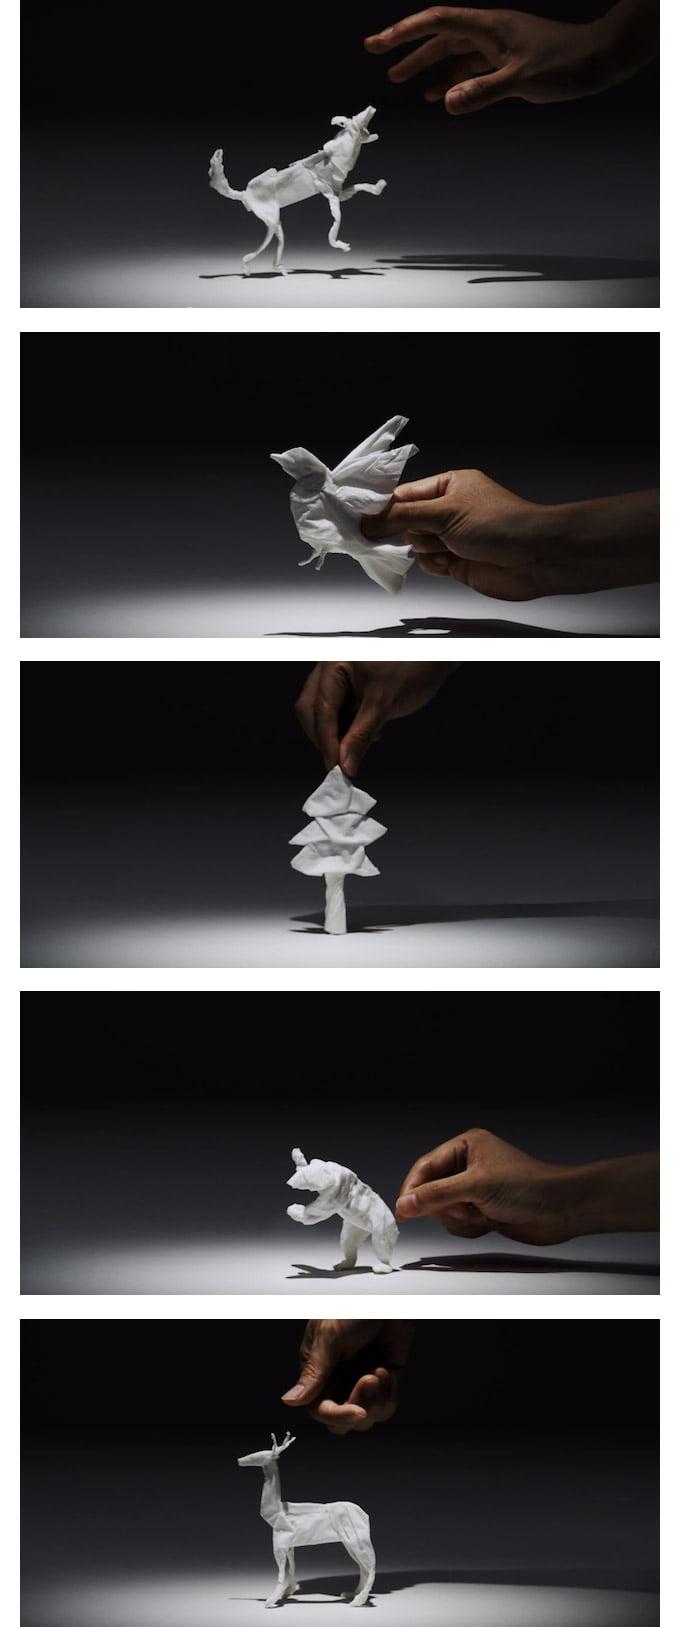 kağıt-katlama-sanatı